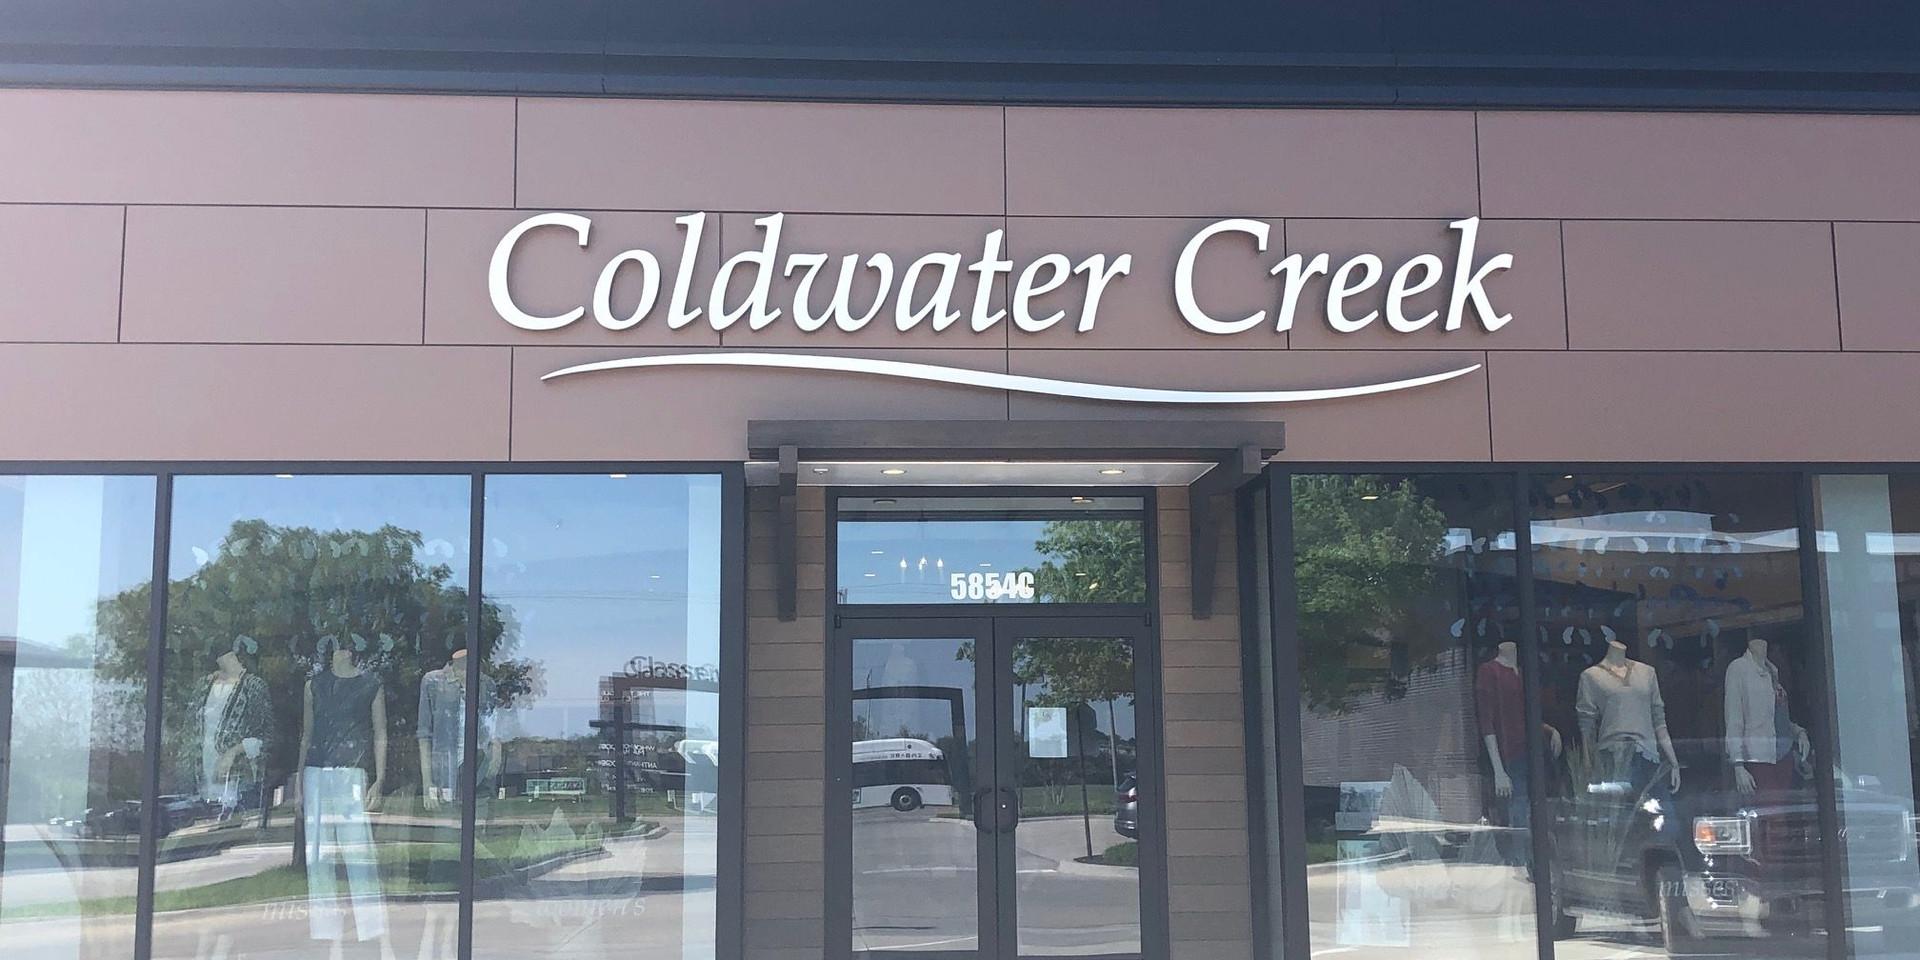 Coldwater Creek.jpeg